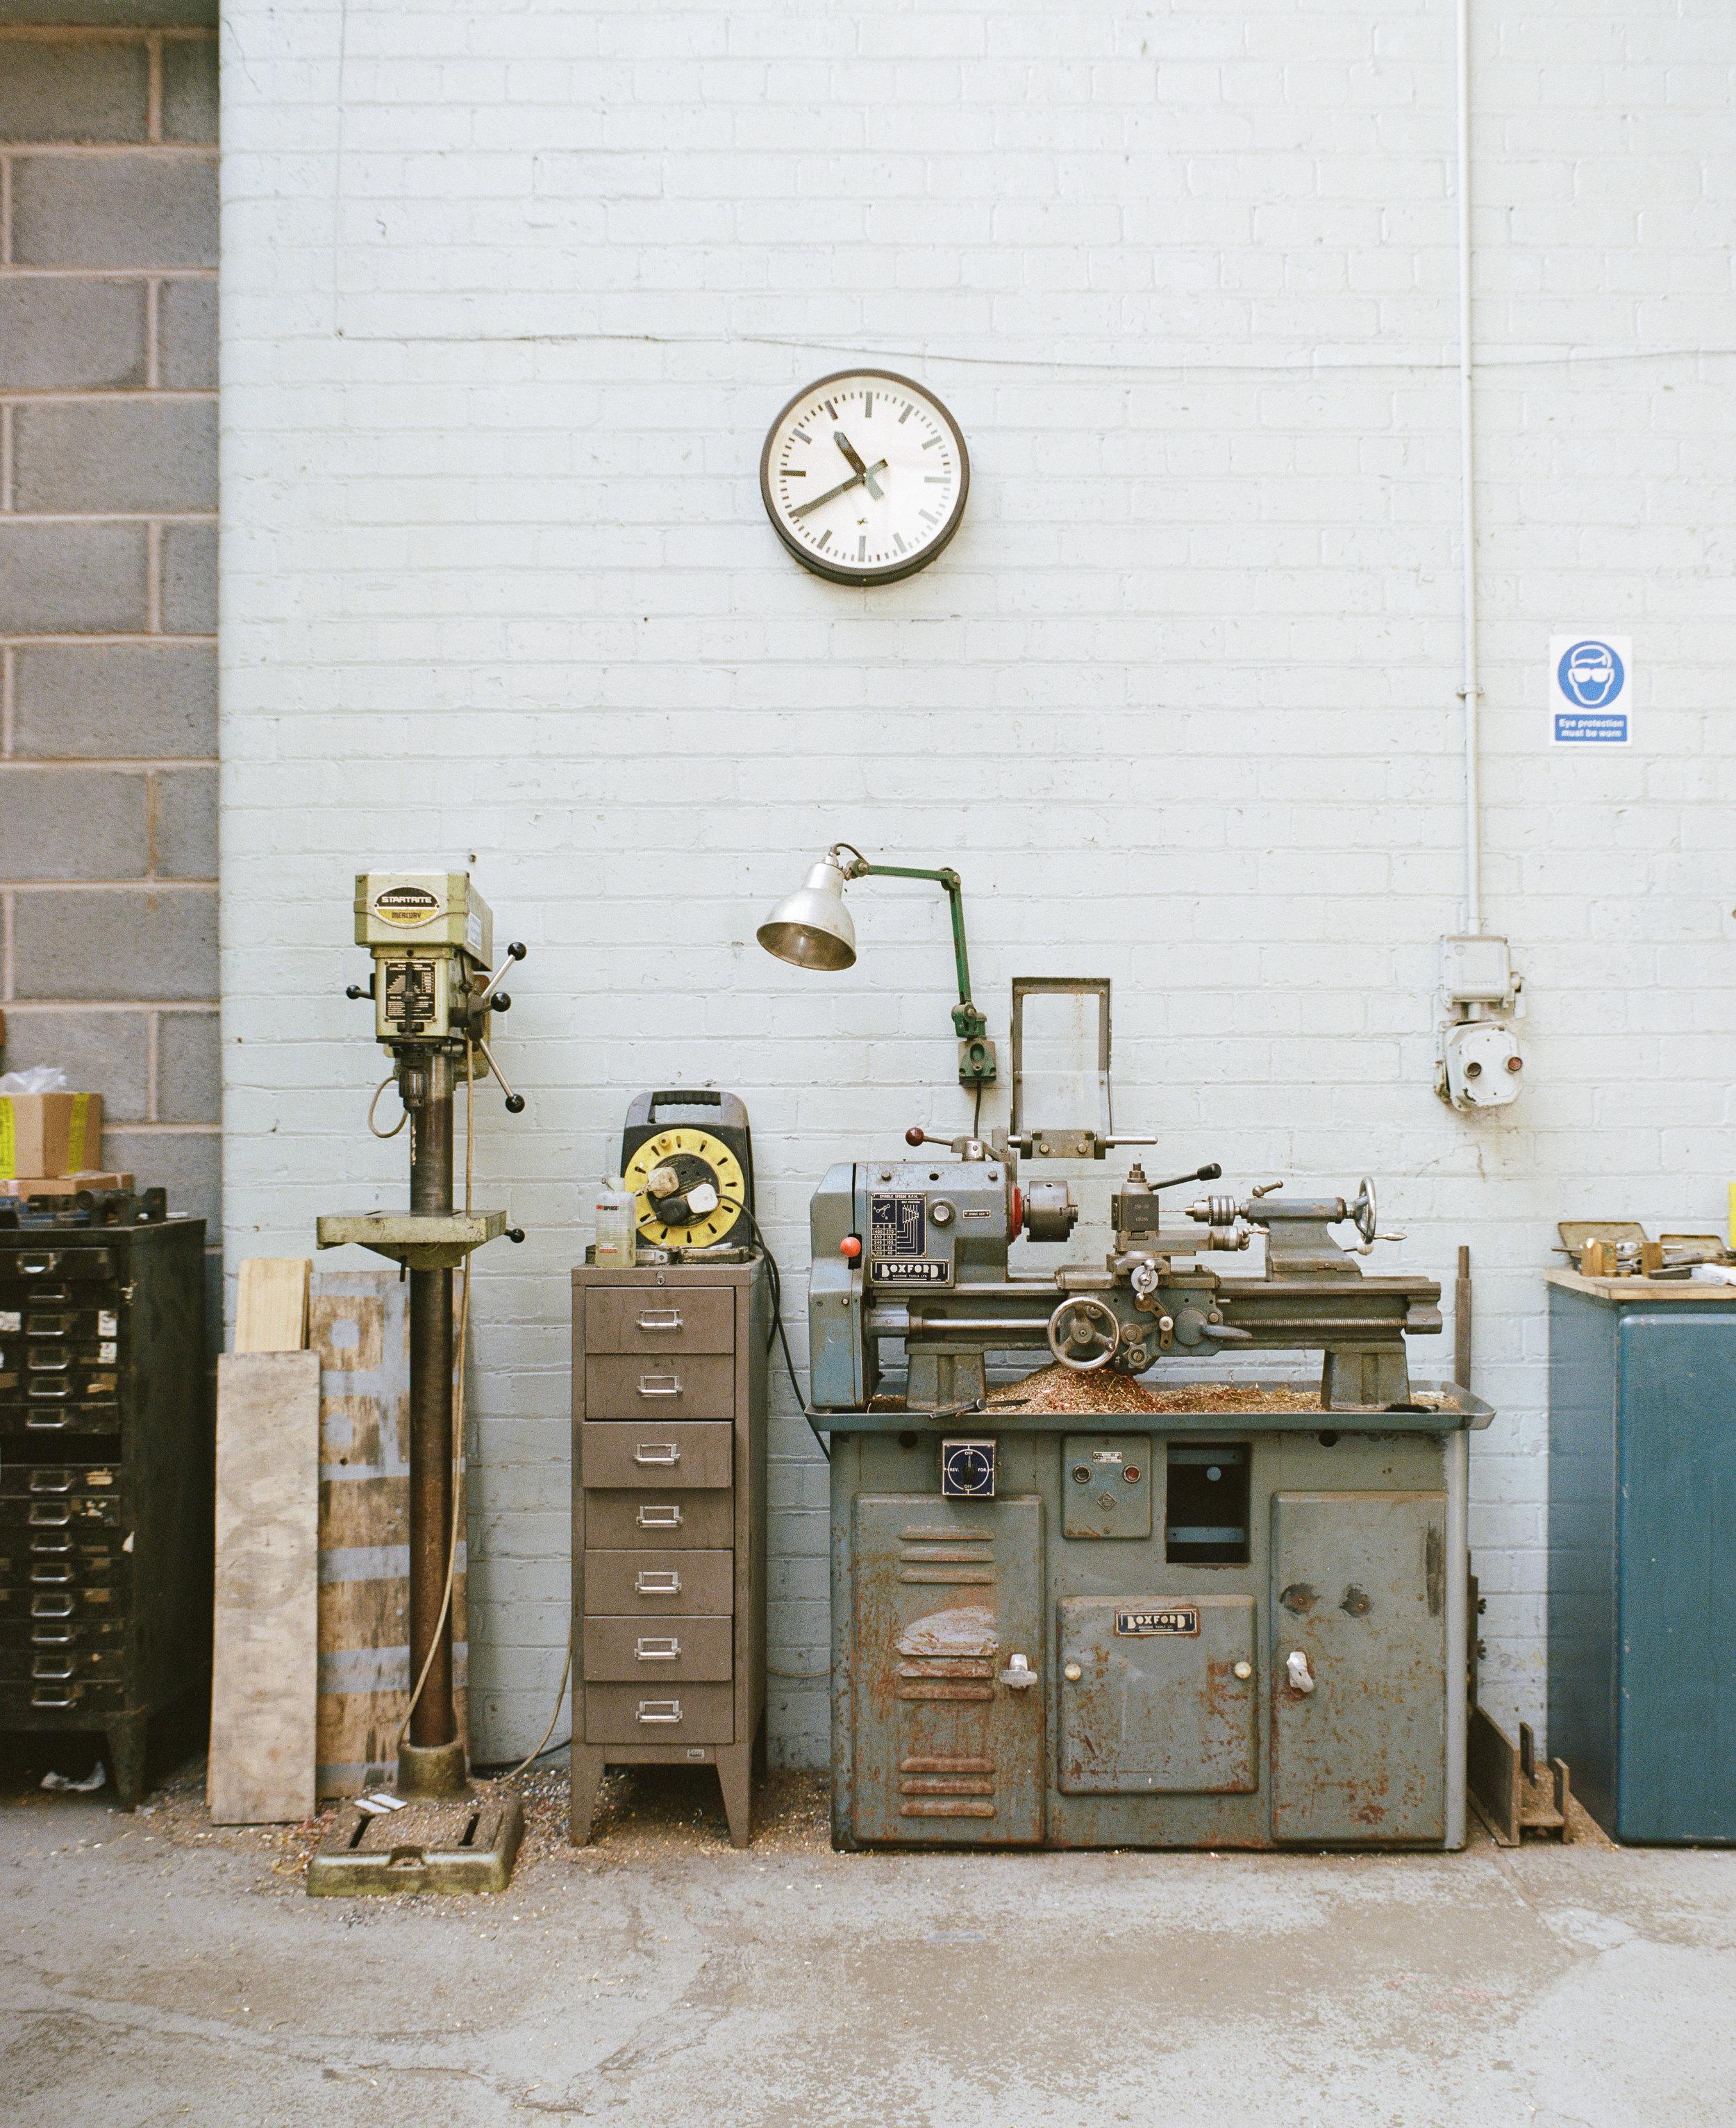 Workshop photography by  Jordan Michael